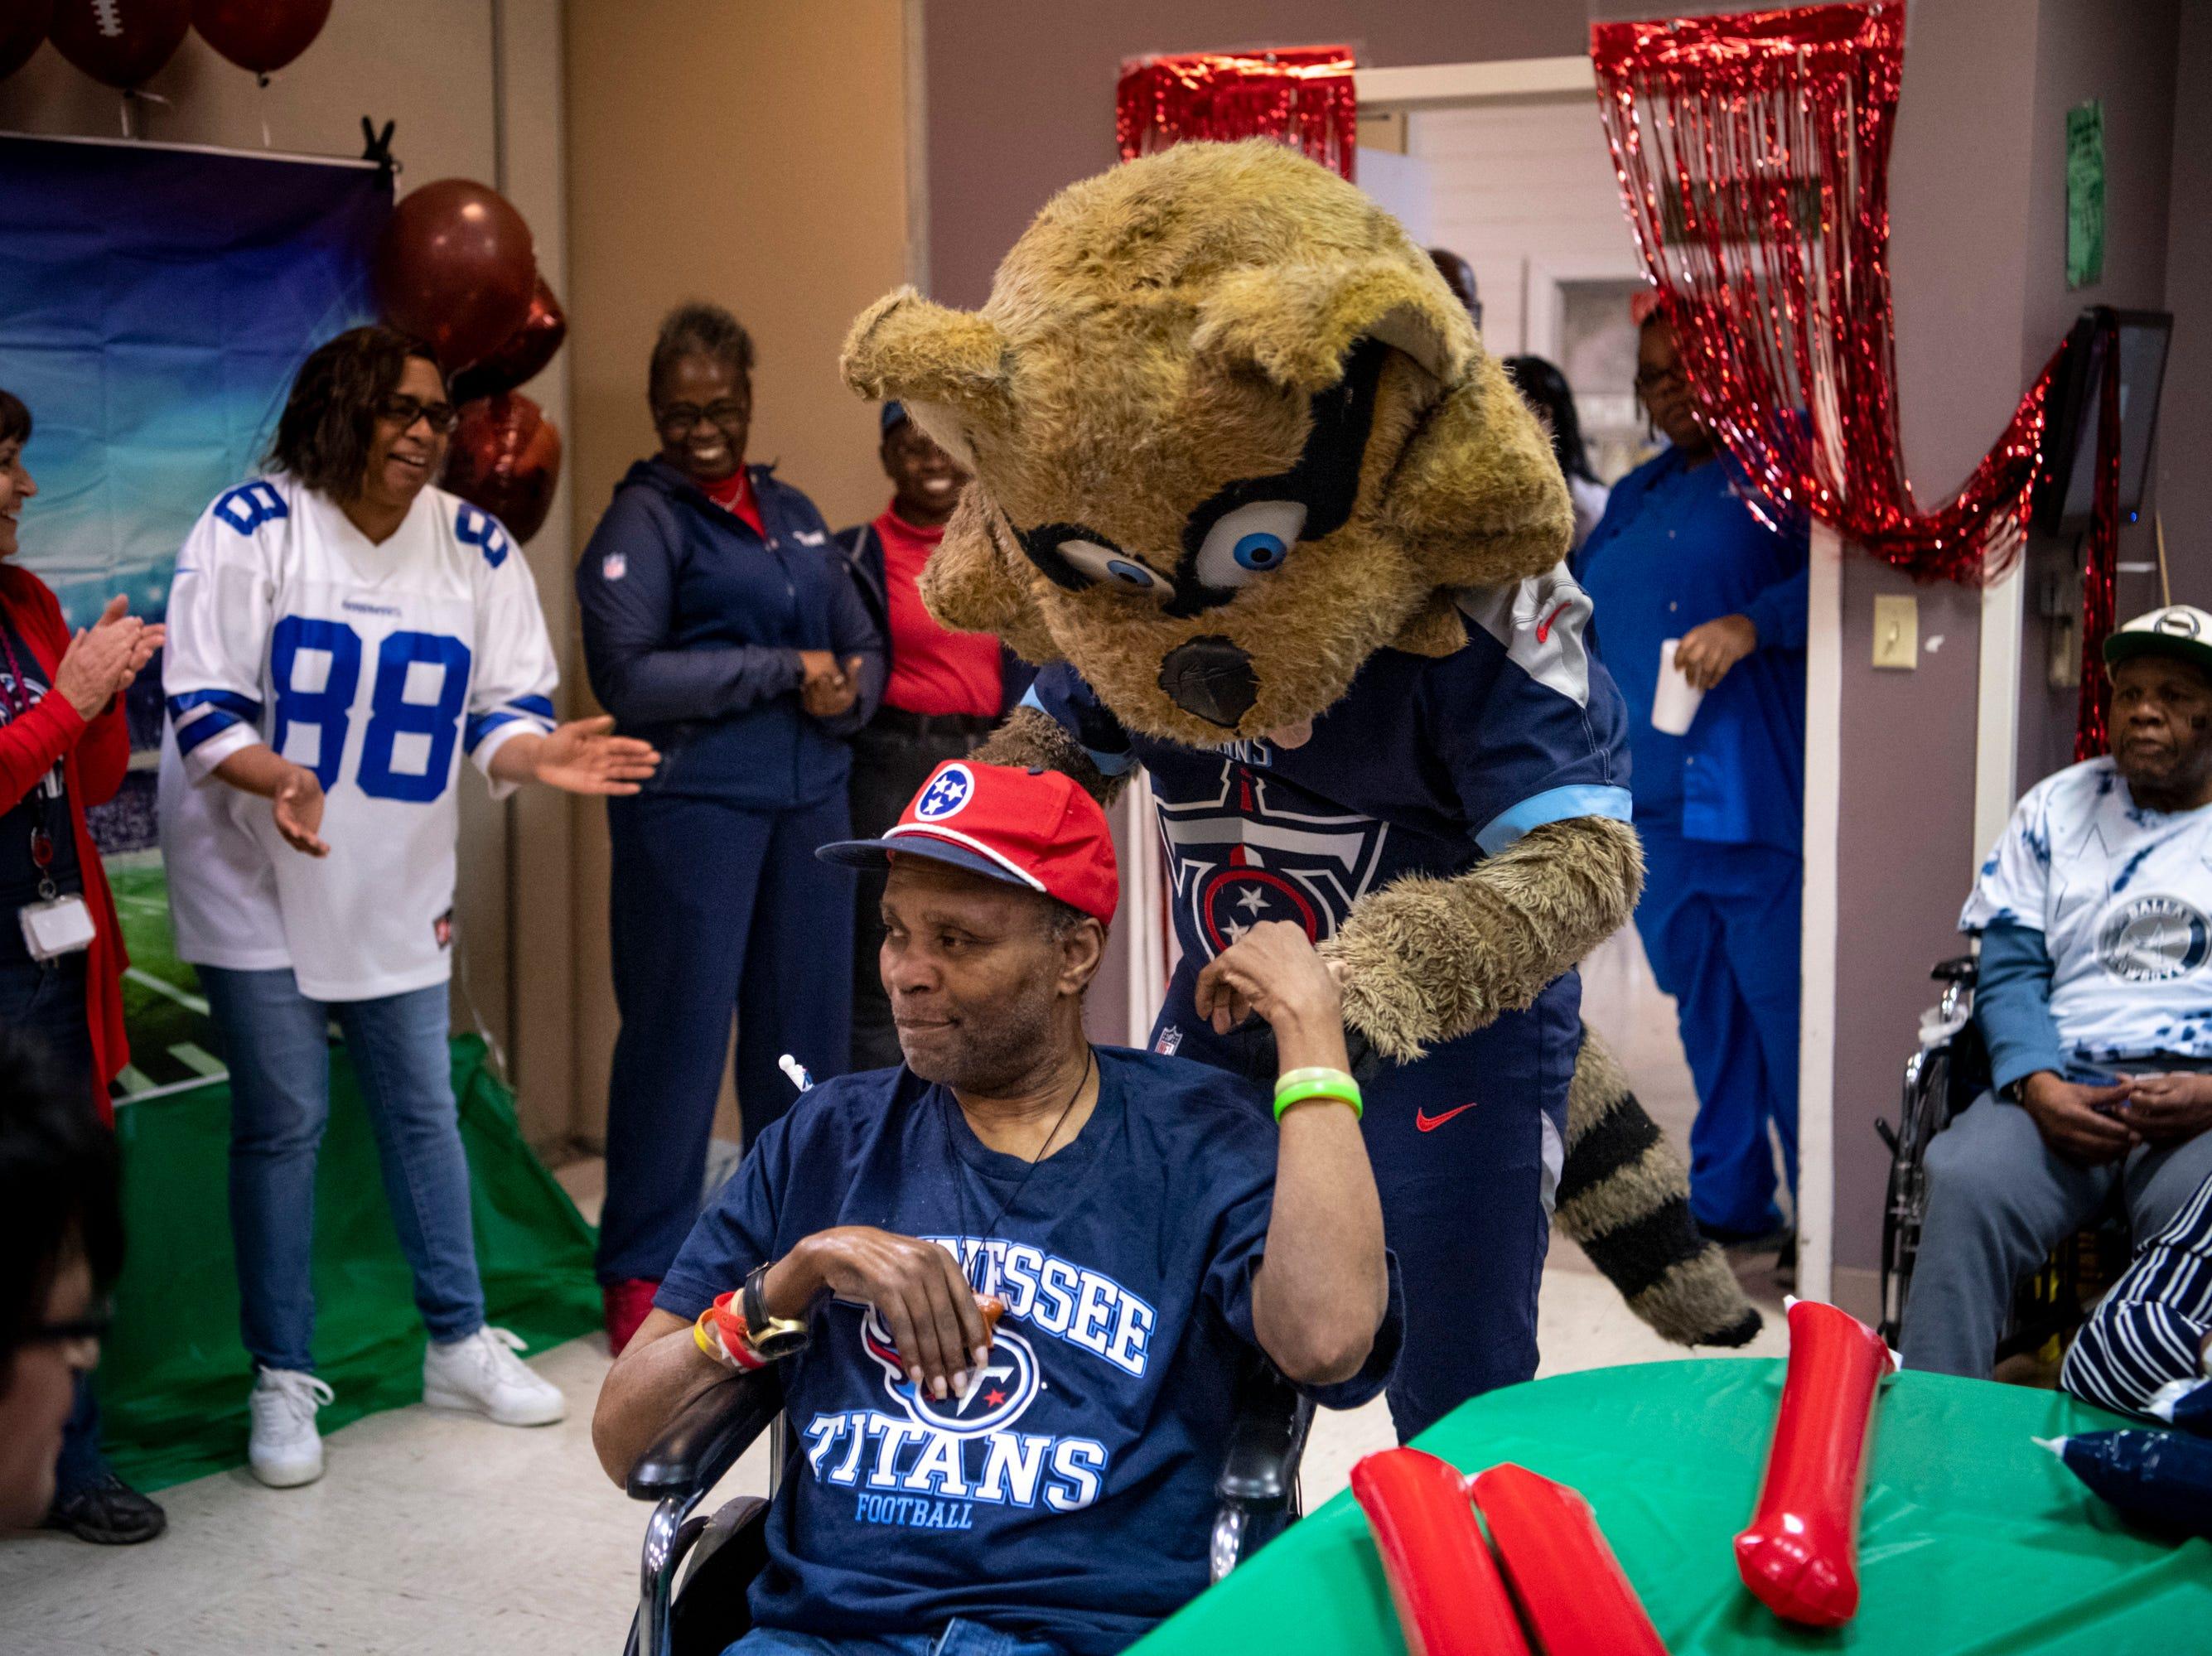 The Titans mascot T-Rac greets Sam Sims before the Wheelchair Super Bowl at Nashville Community Care and Rehabilitation at Bordeaux in Nashville, Tenn., Friday, Feb. 1, 2019.